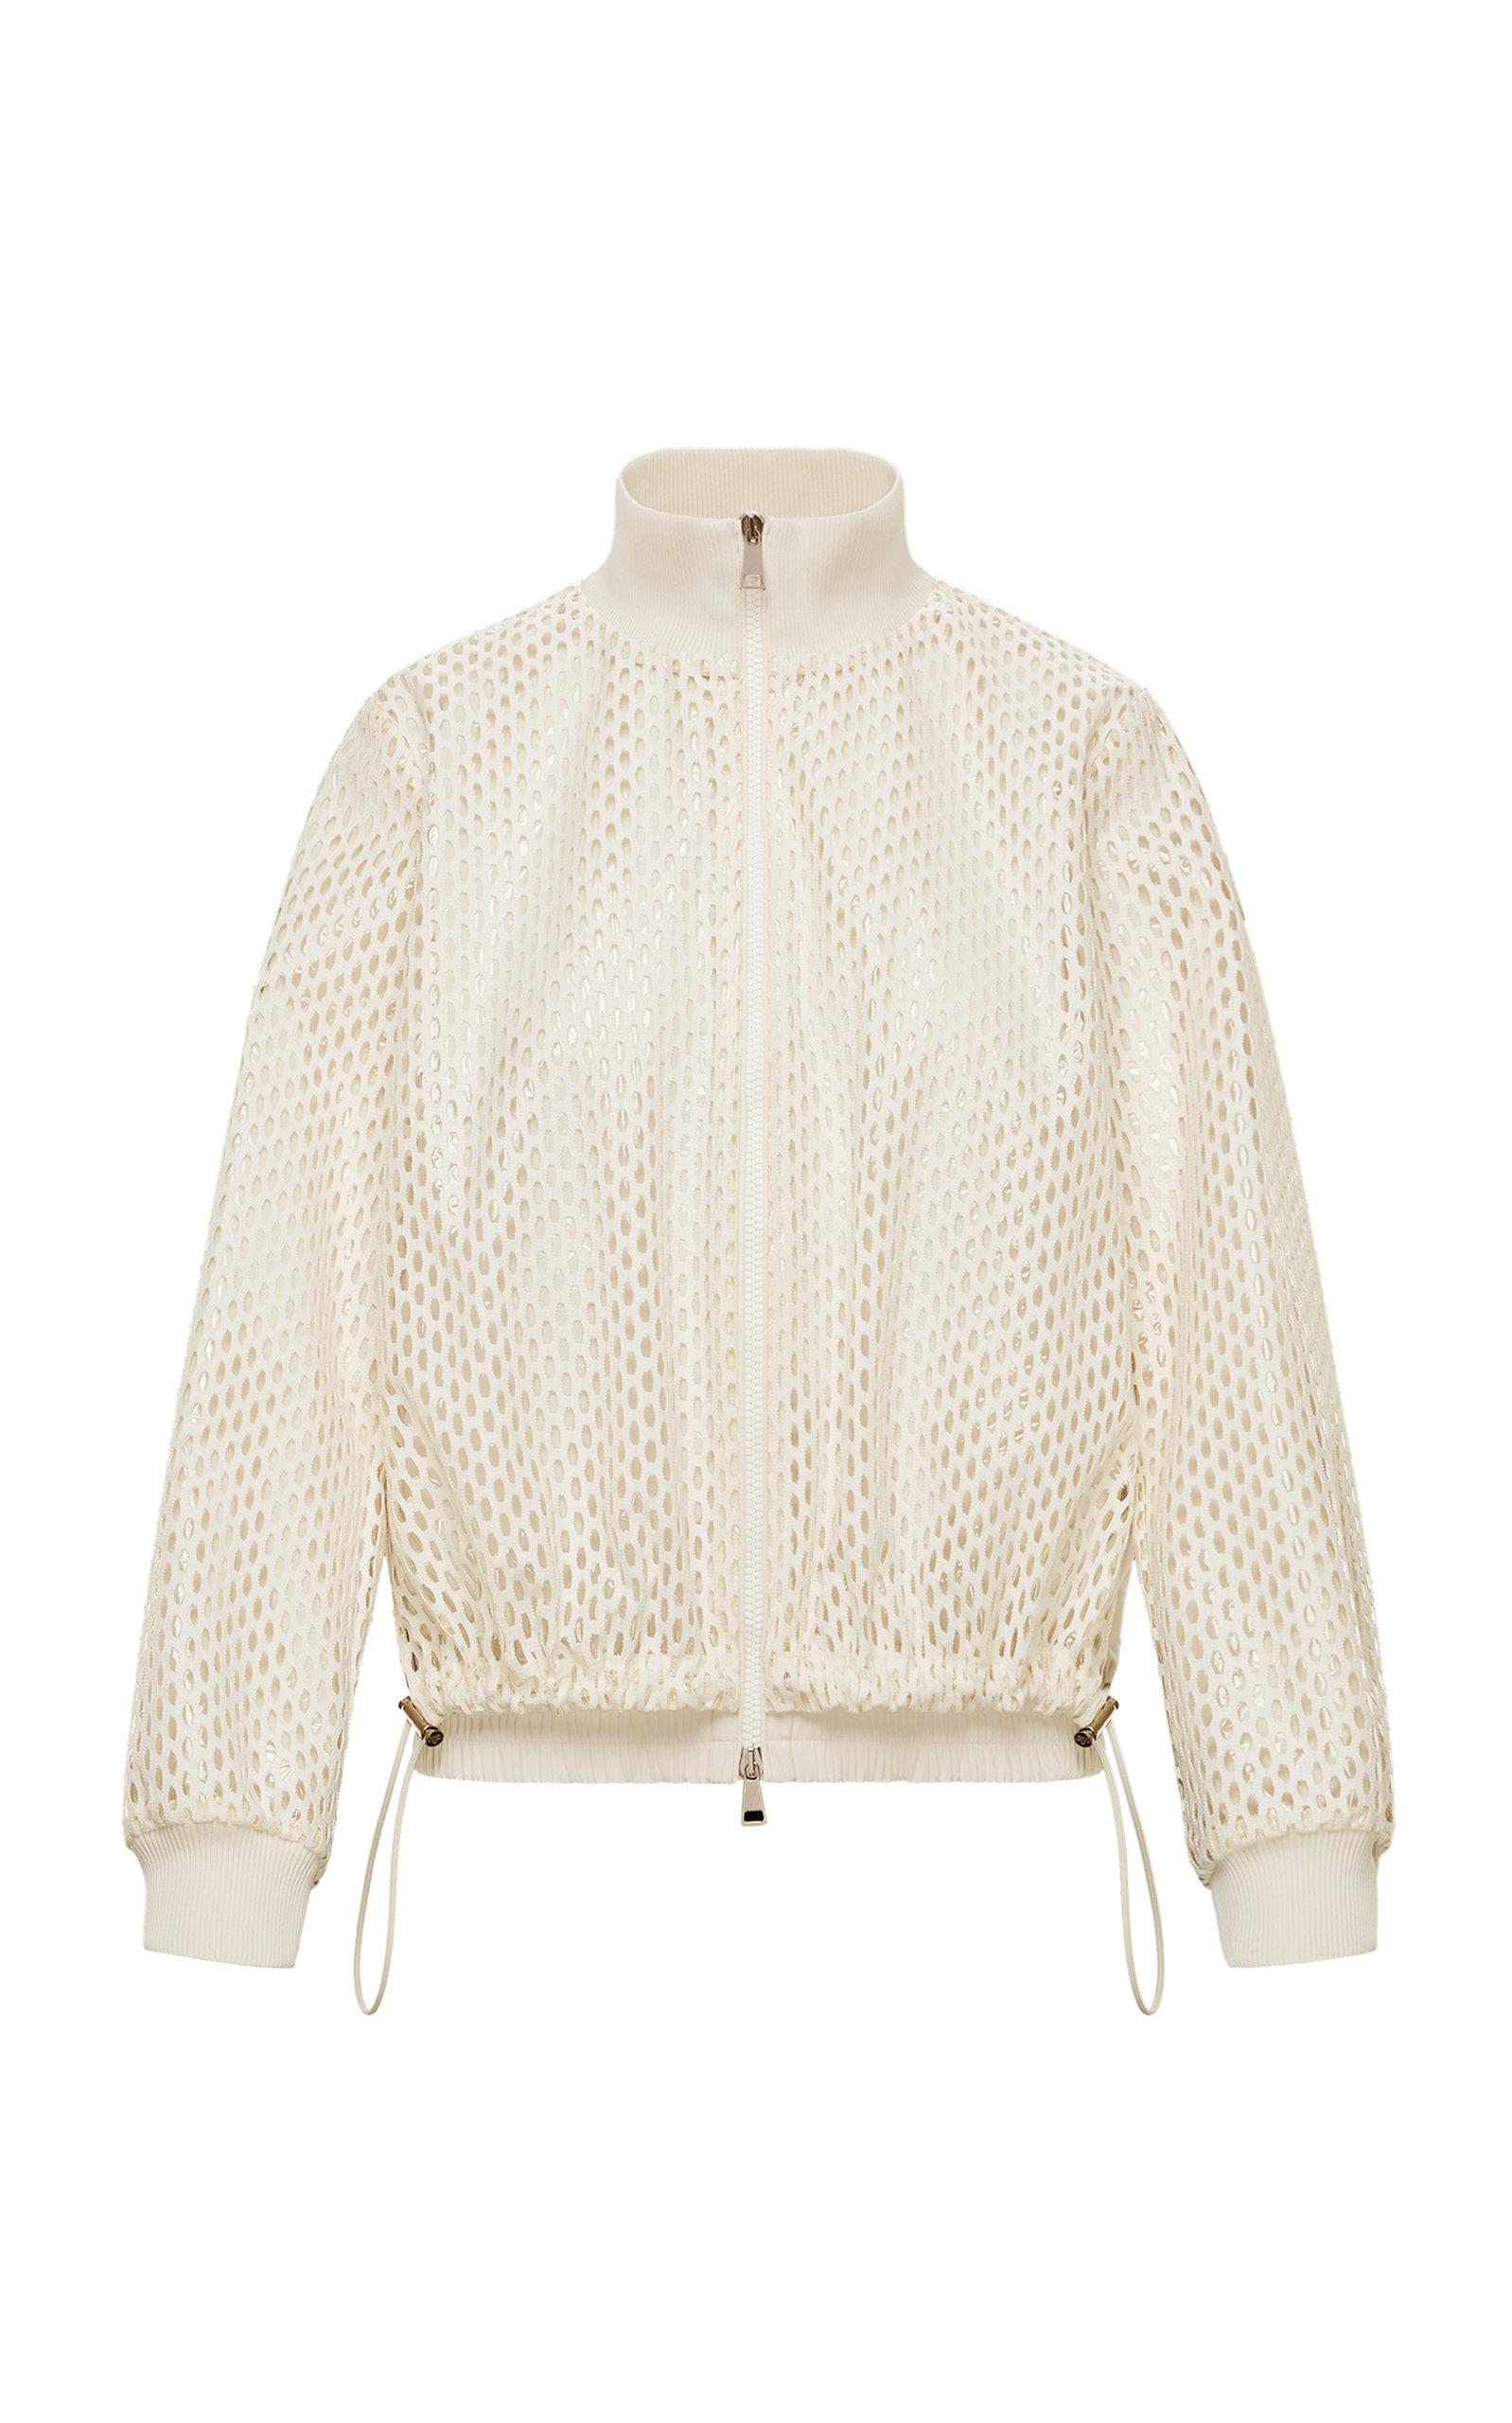 Moncler - Women's Pulcherrima Cotton-Blend Mesh Jacket - White - Moda Operandi